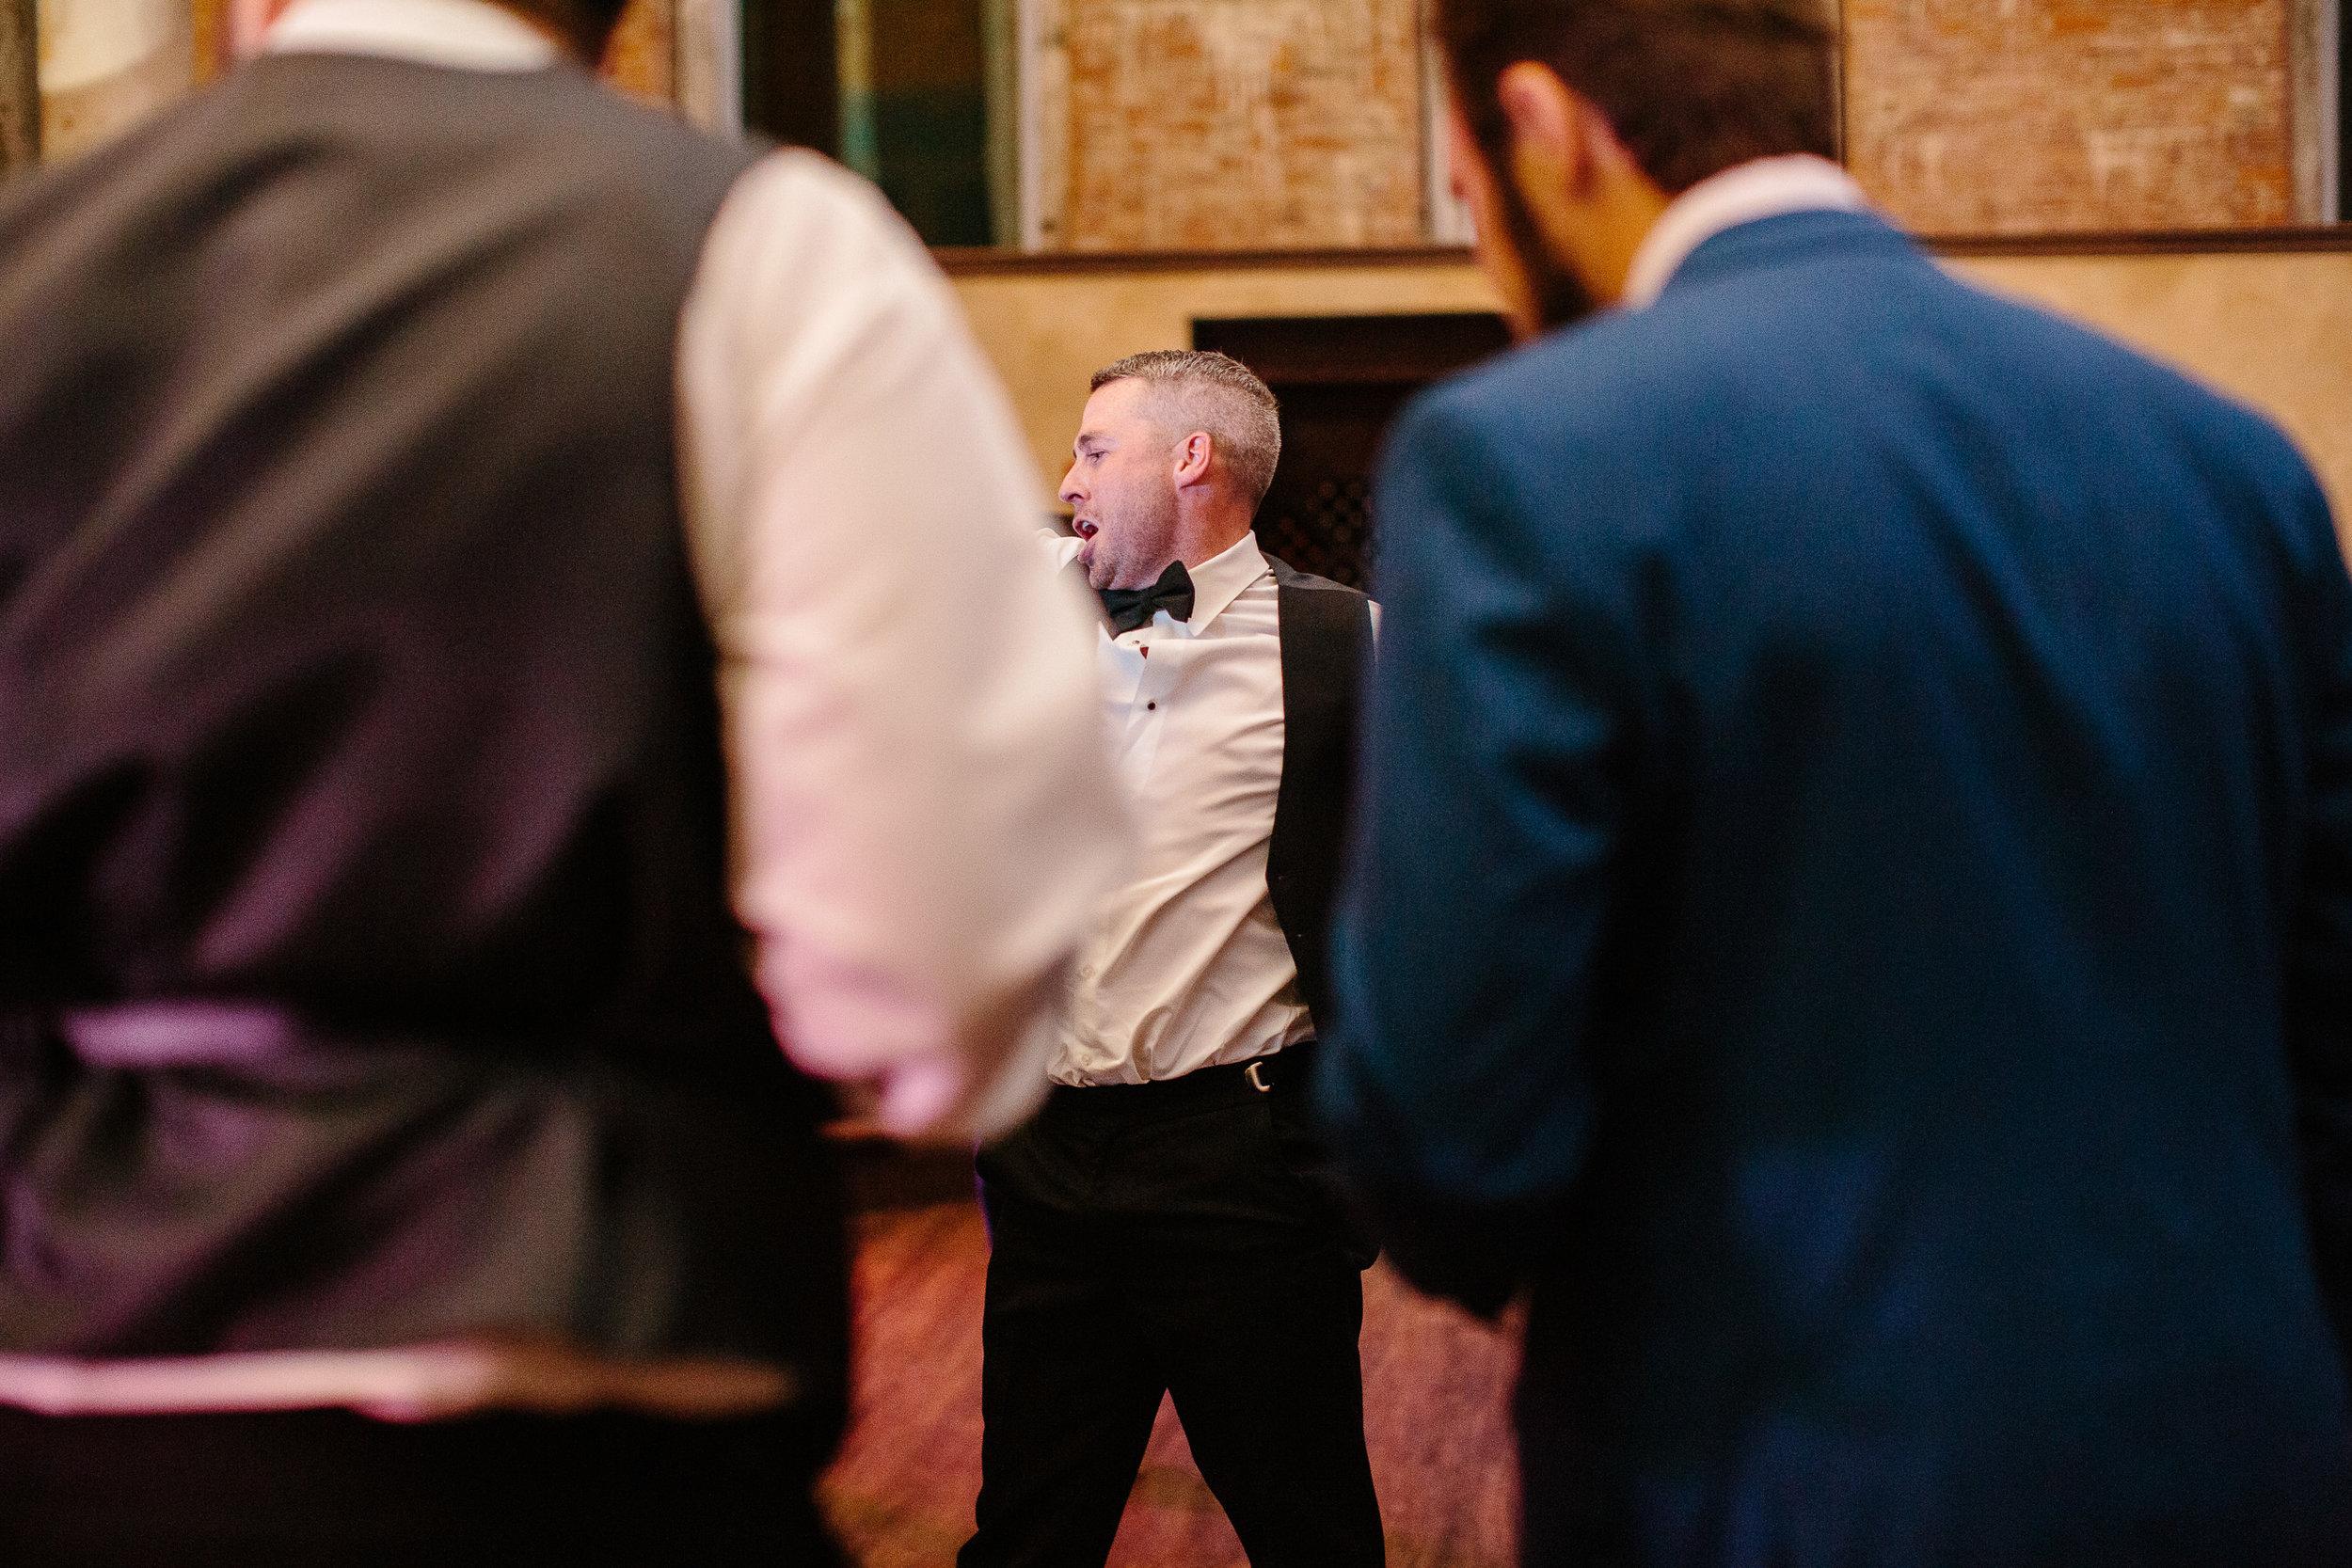 0746_20170819 Randi and Chance Wedding.jpg